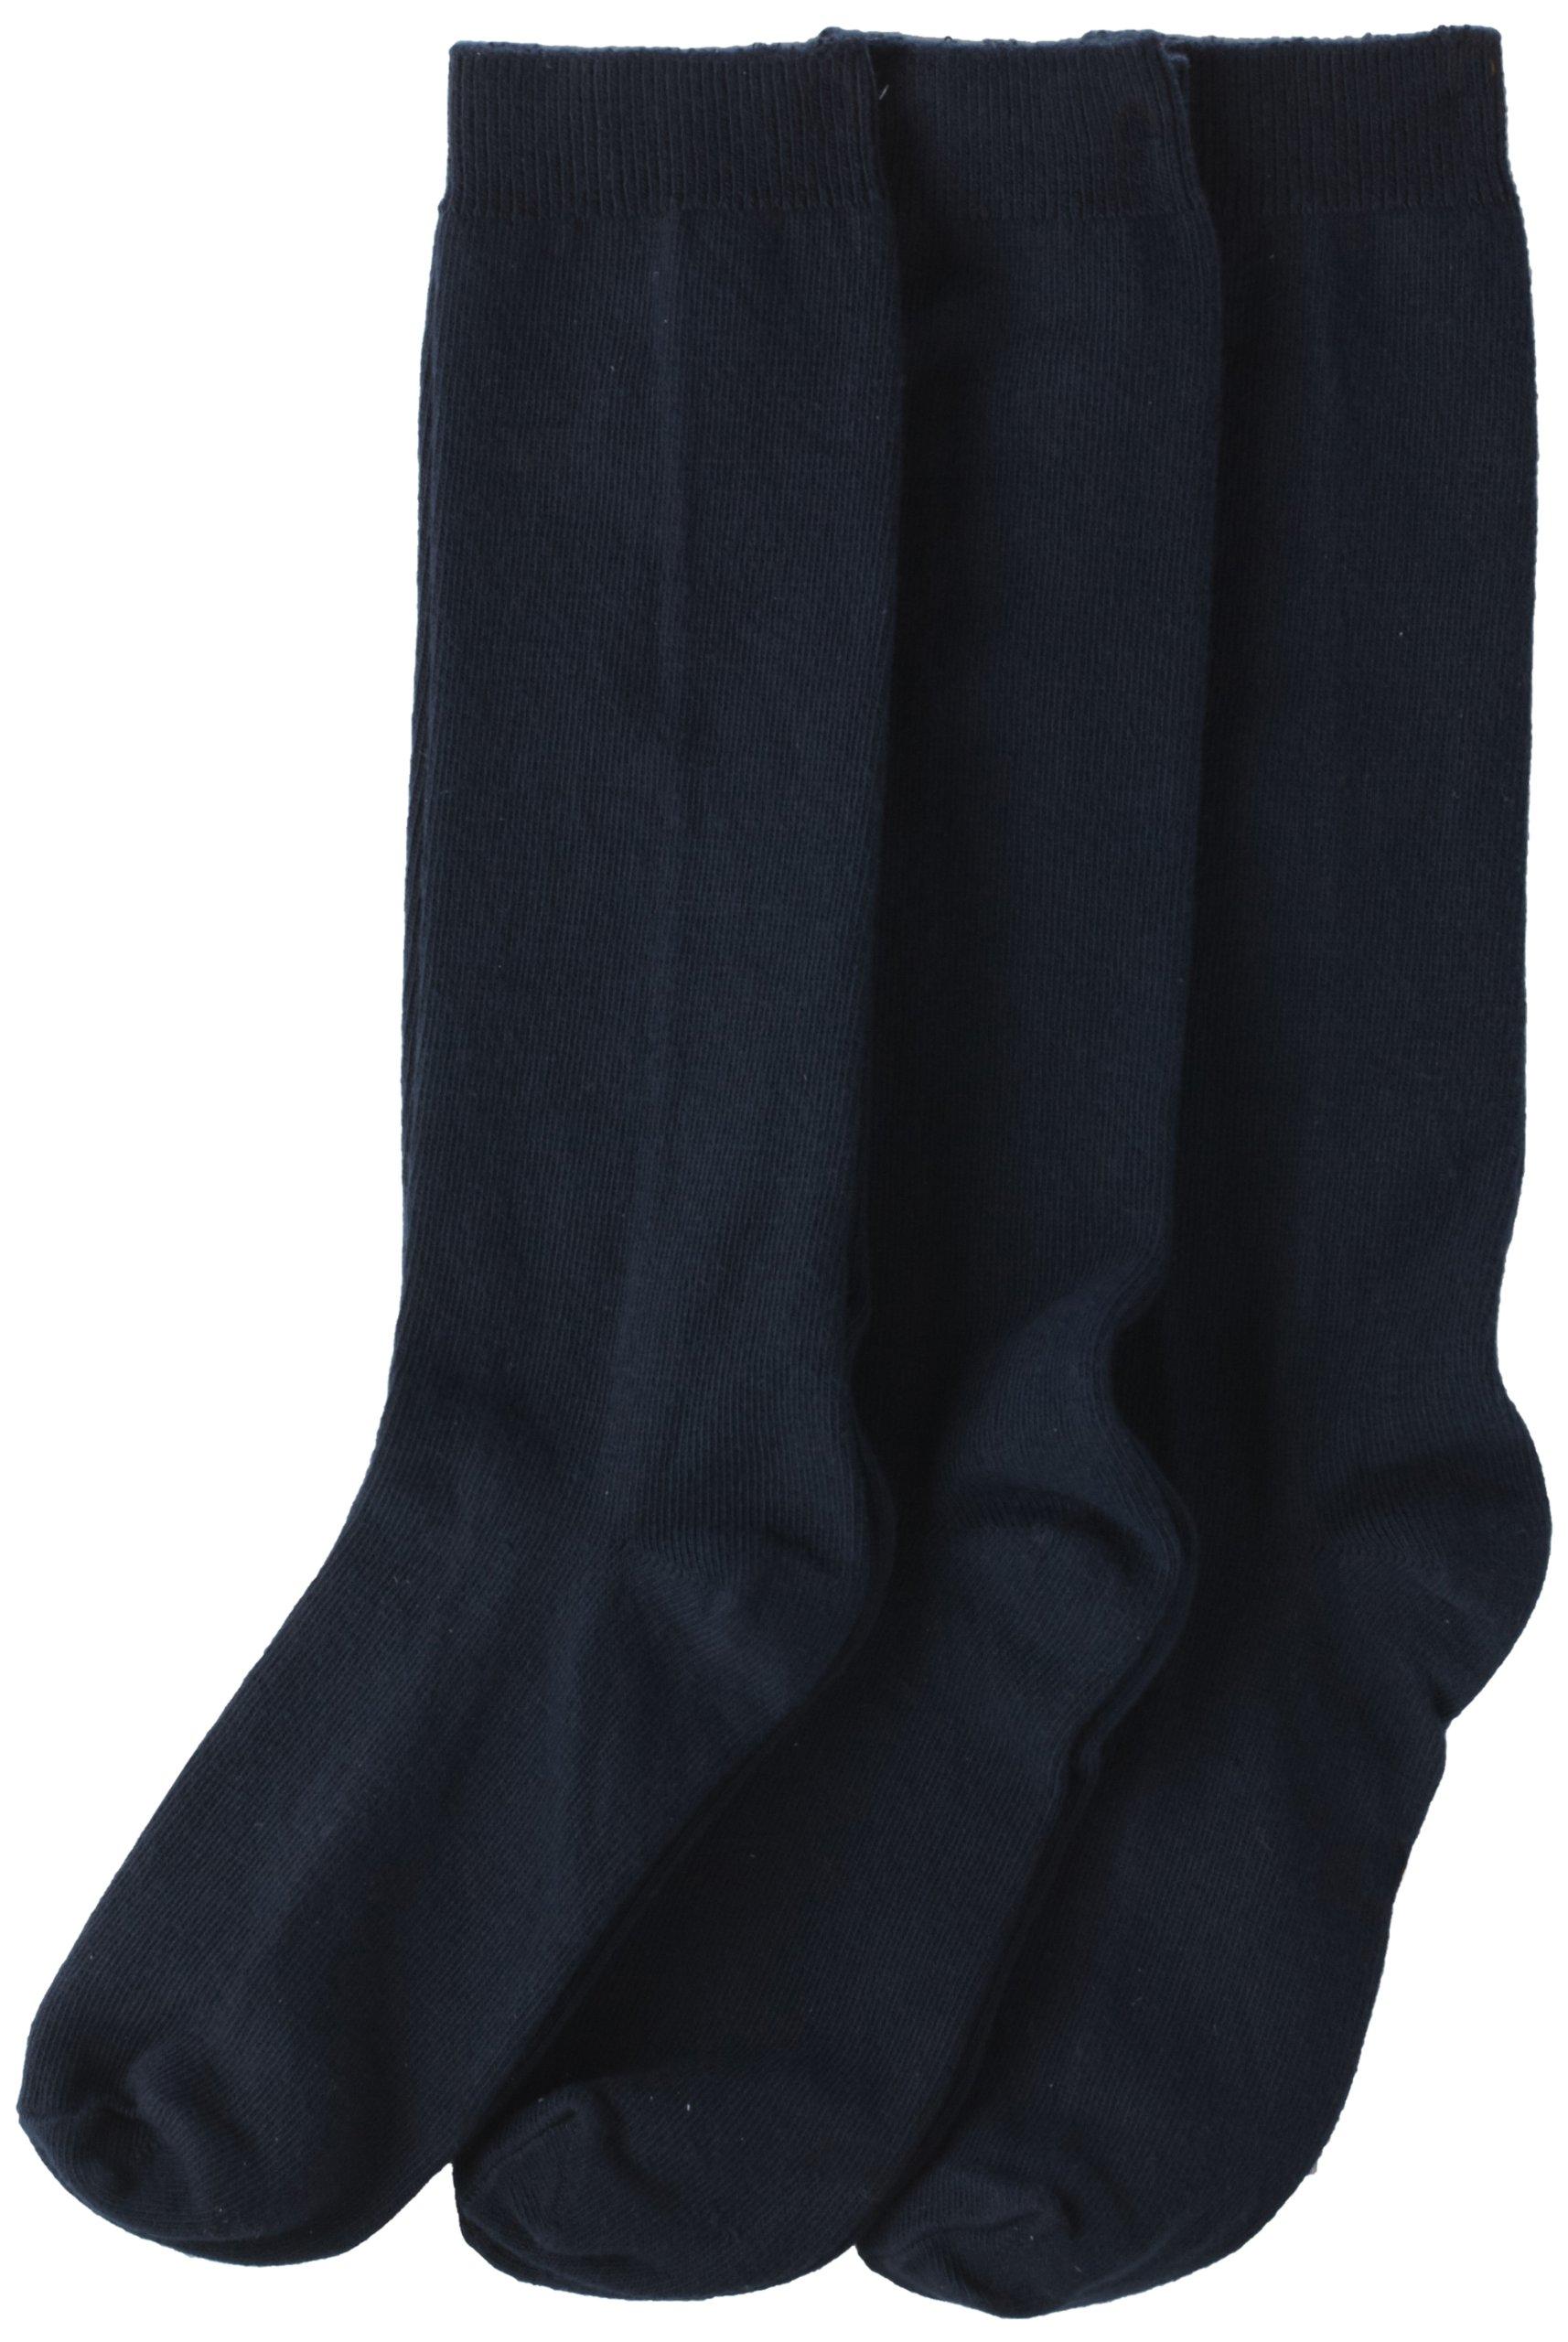 Jefferies Socks Big Girls' School Uniform Knee High (Pack of 3), Navy, Medium